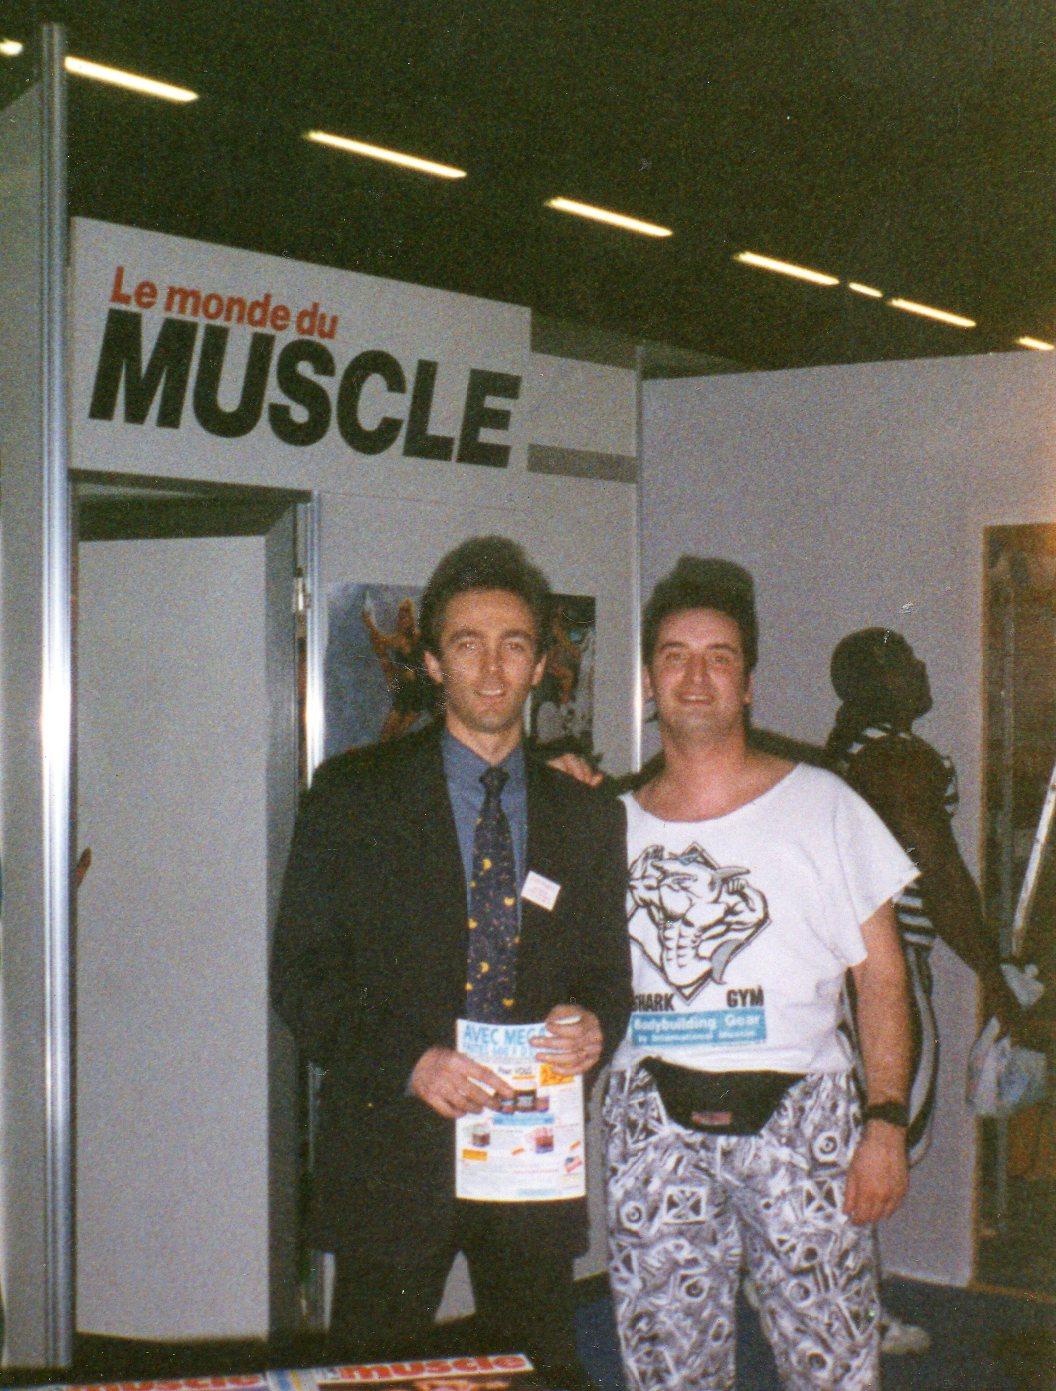 http://images.onlc.eu/muscle-catrinOEU//130608008523.jpg